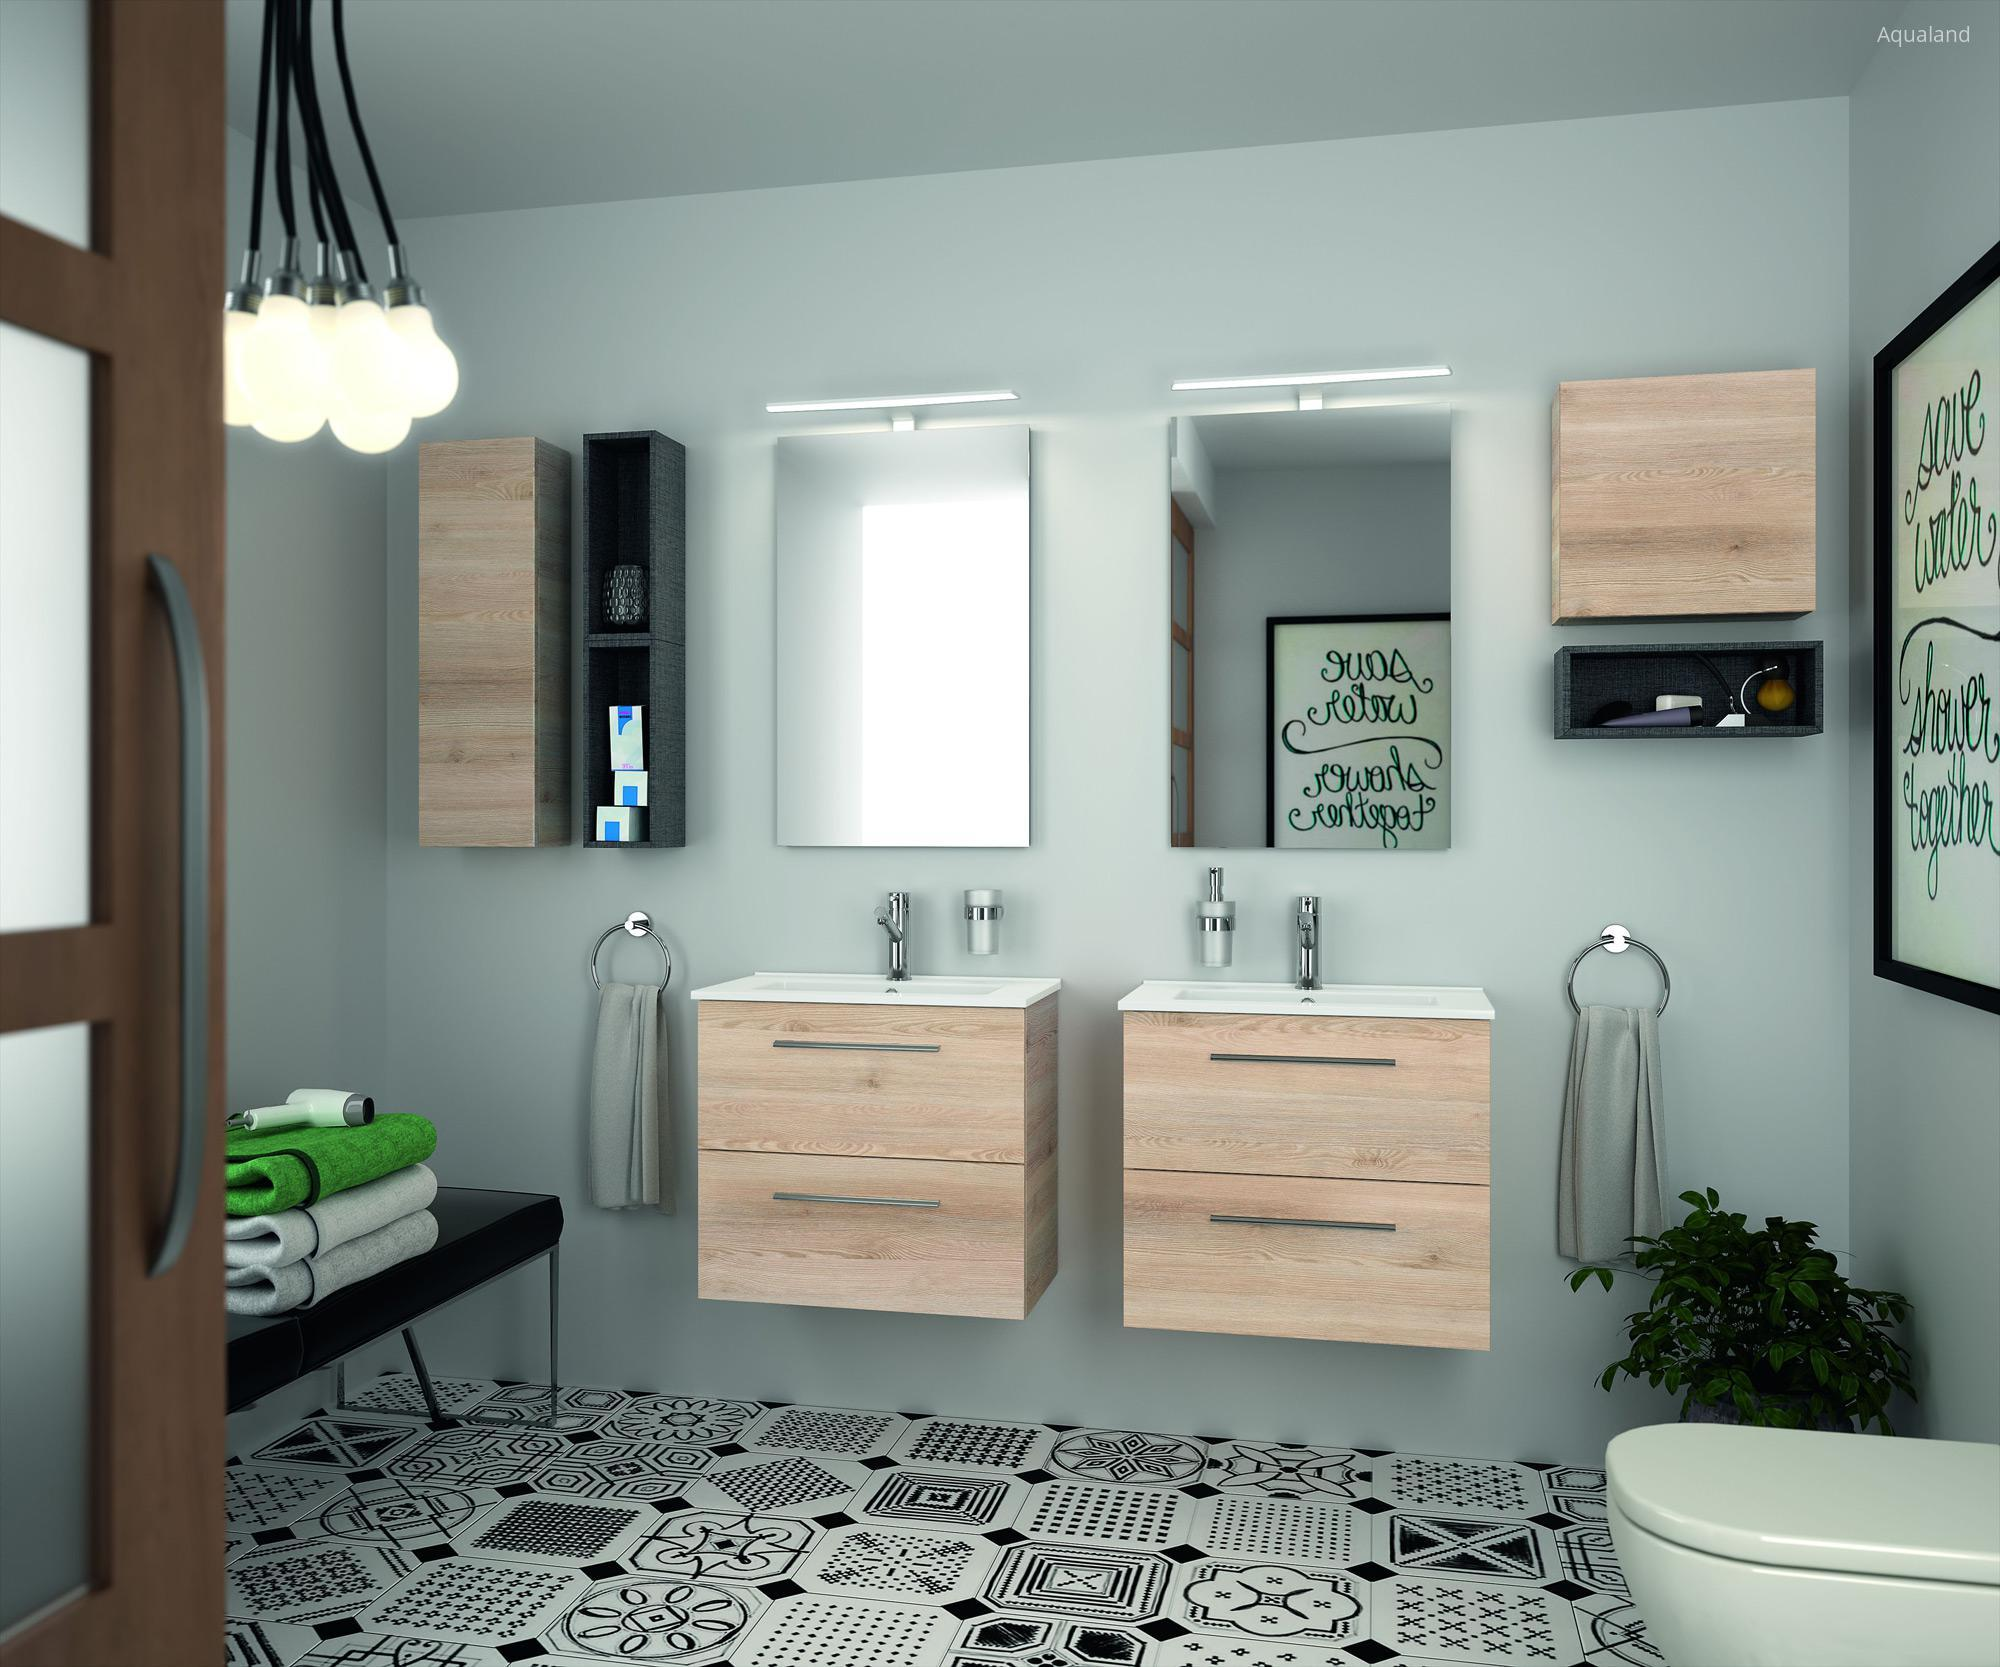 Salgar S35 fürdőszoba bútor fiókkal // HOMEINFO.hu - Inspirációtár